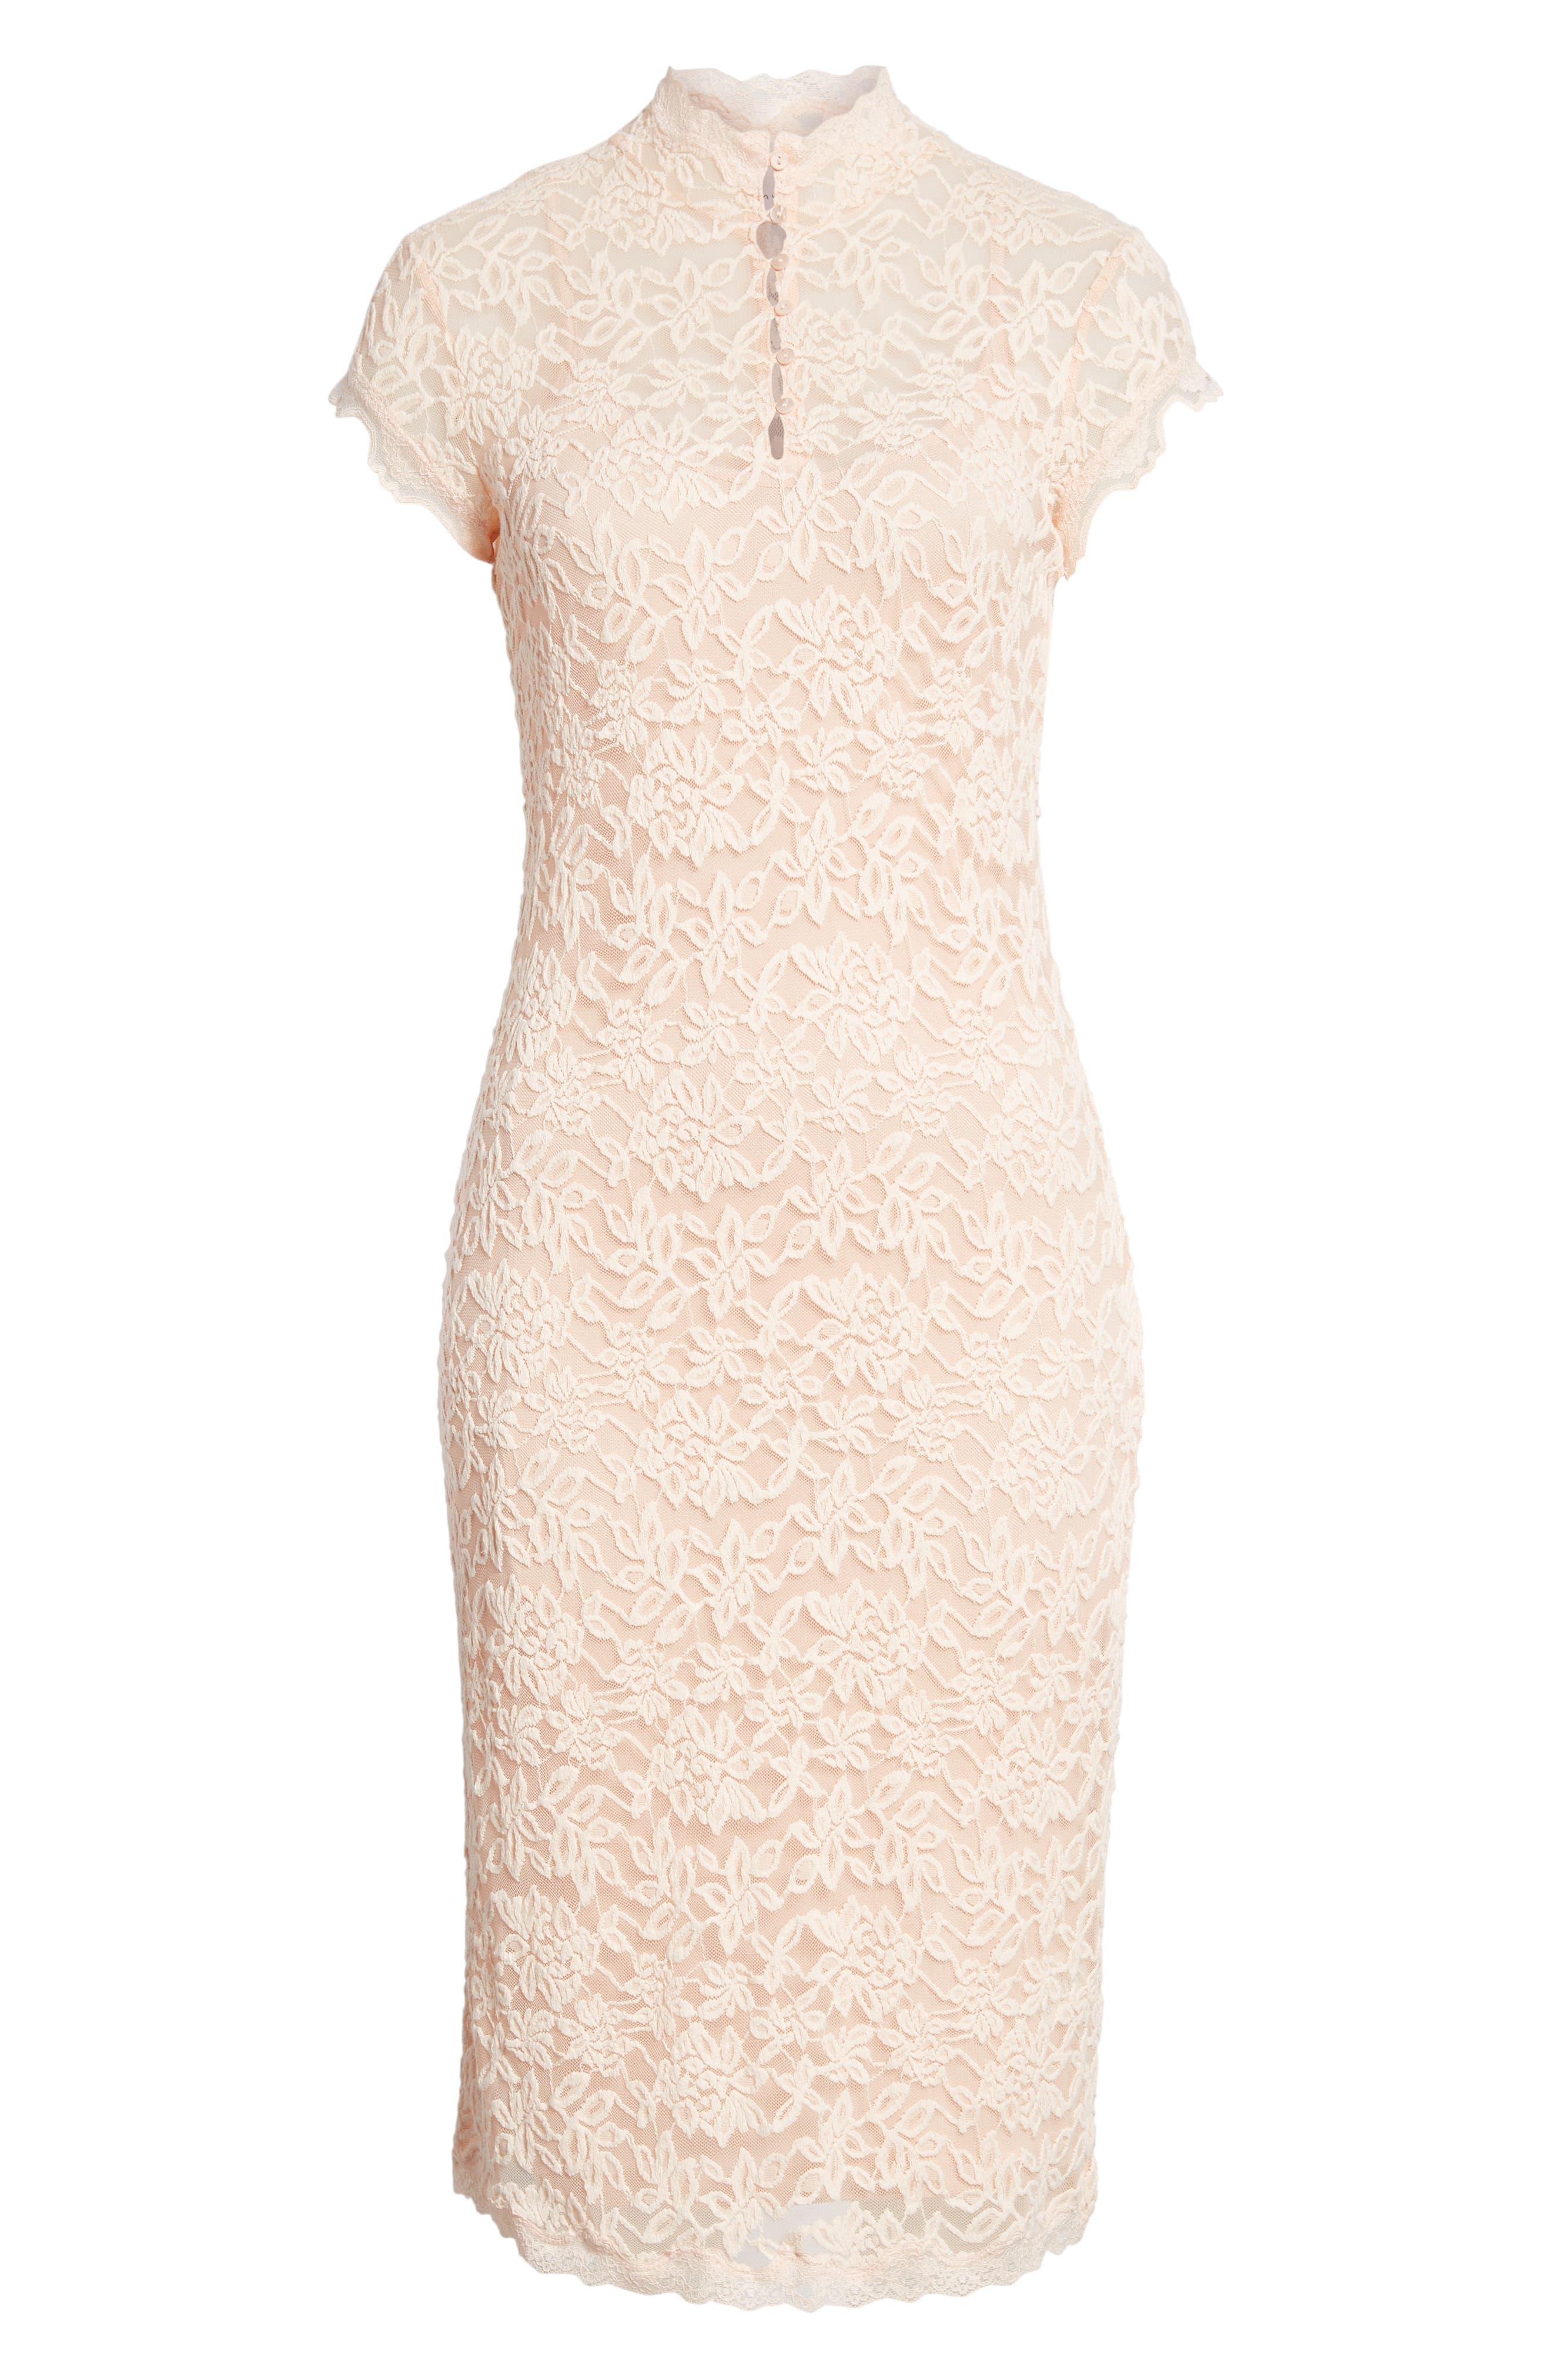 Delicia Lace Body-Con Dress,                             Alternate thumbnail 7, color,                             PALE DOGWOOD